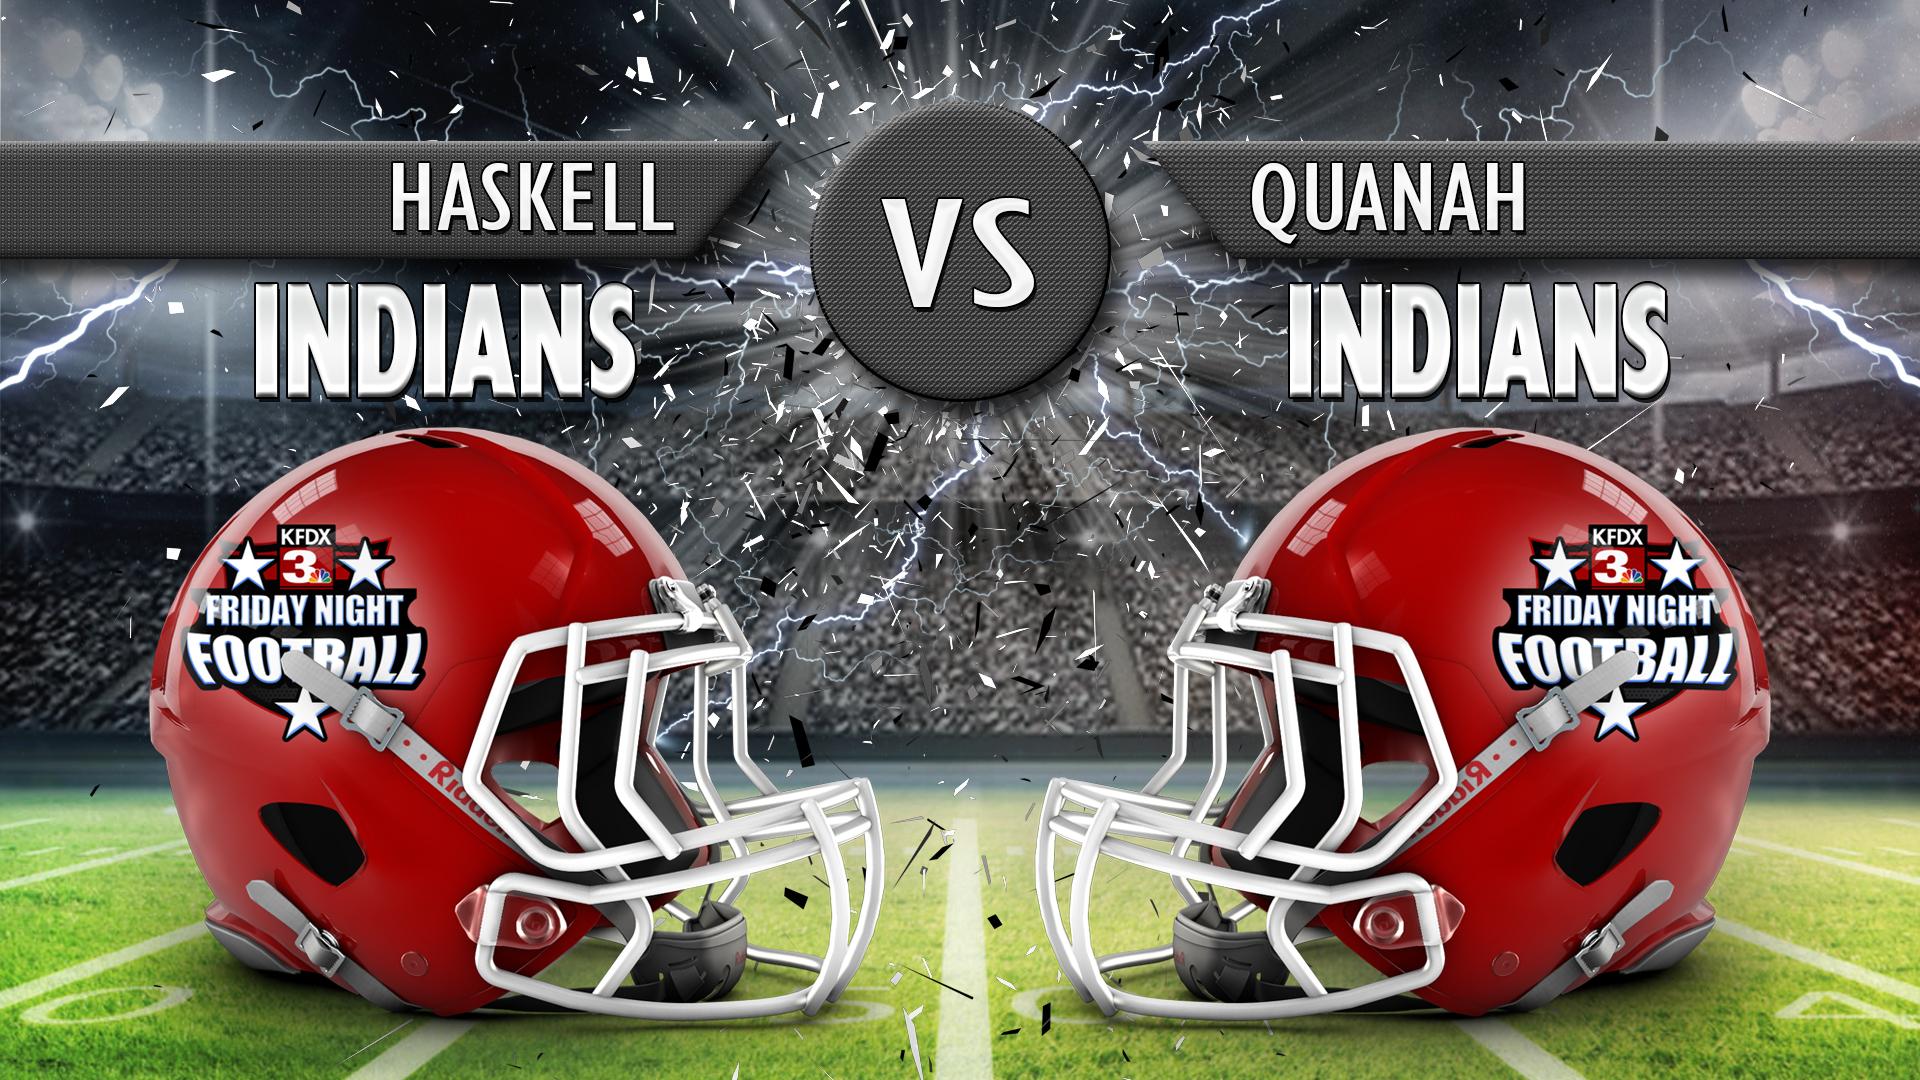 HASKELL VS QUANAH_1535738589637.jpg.jpg